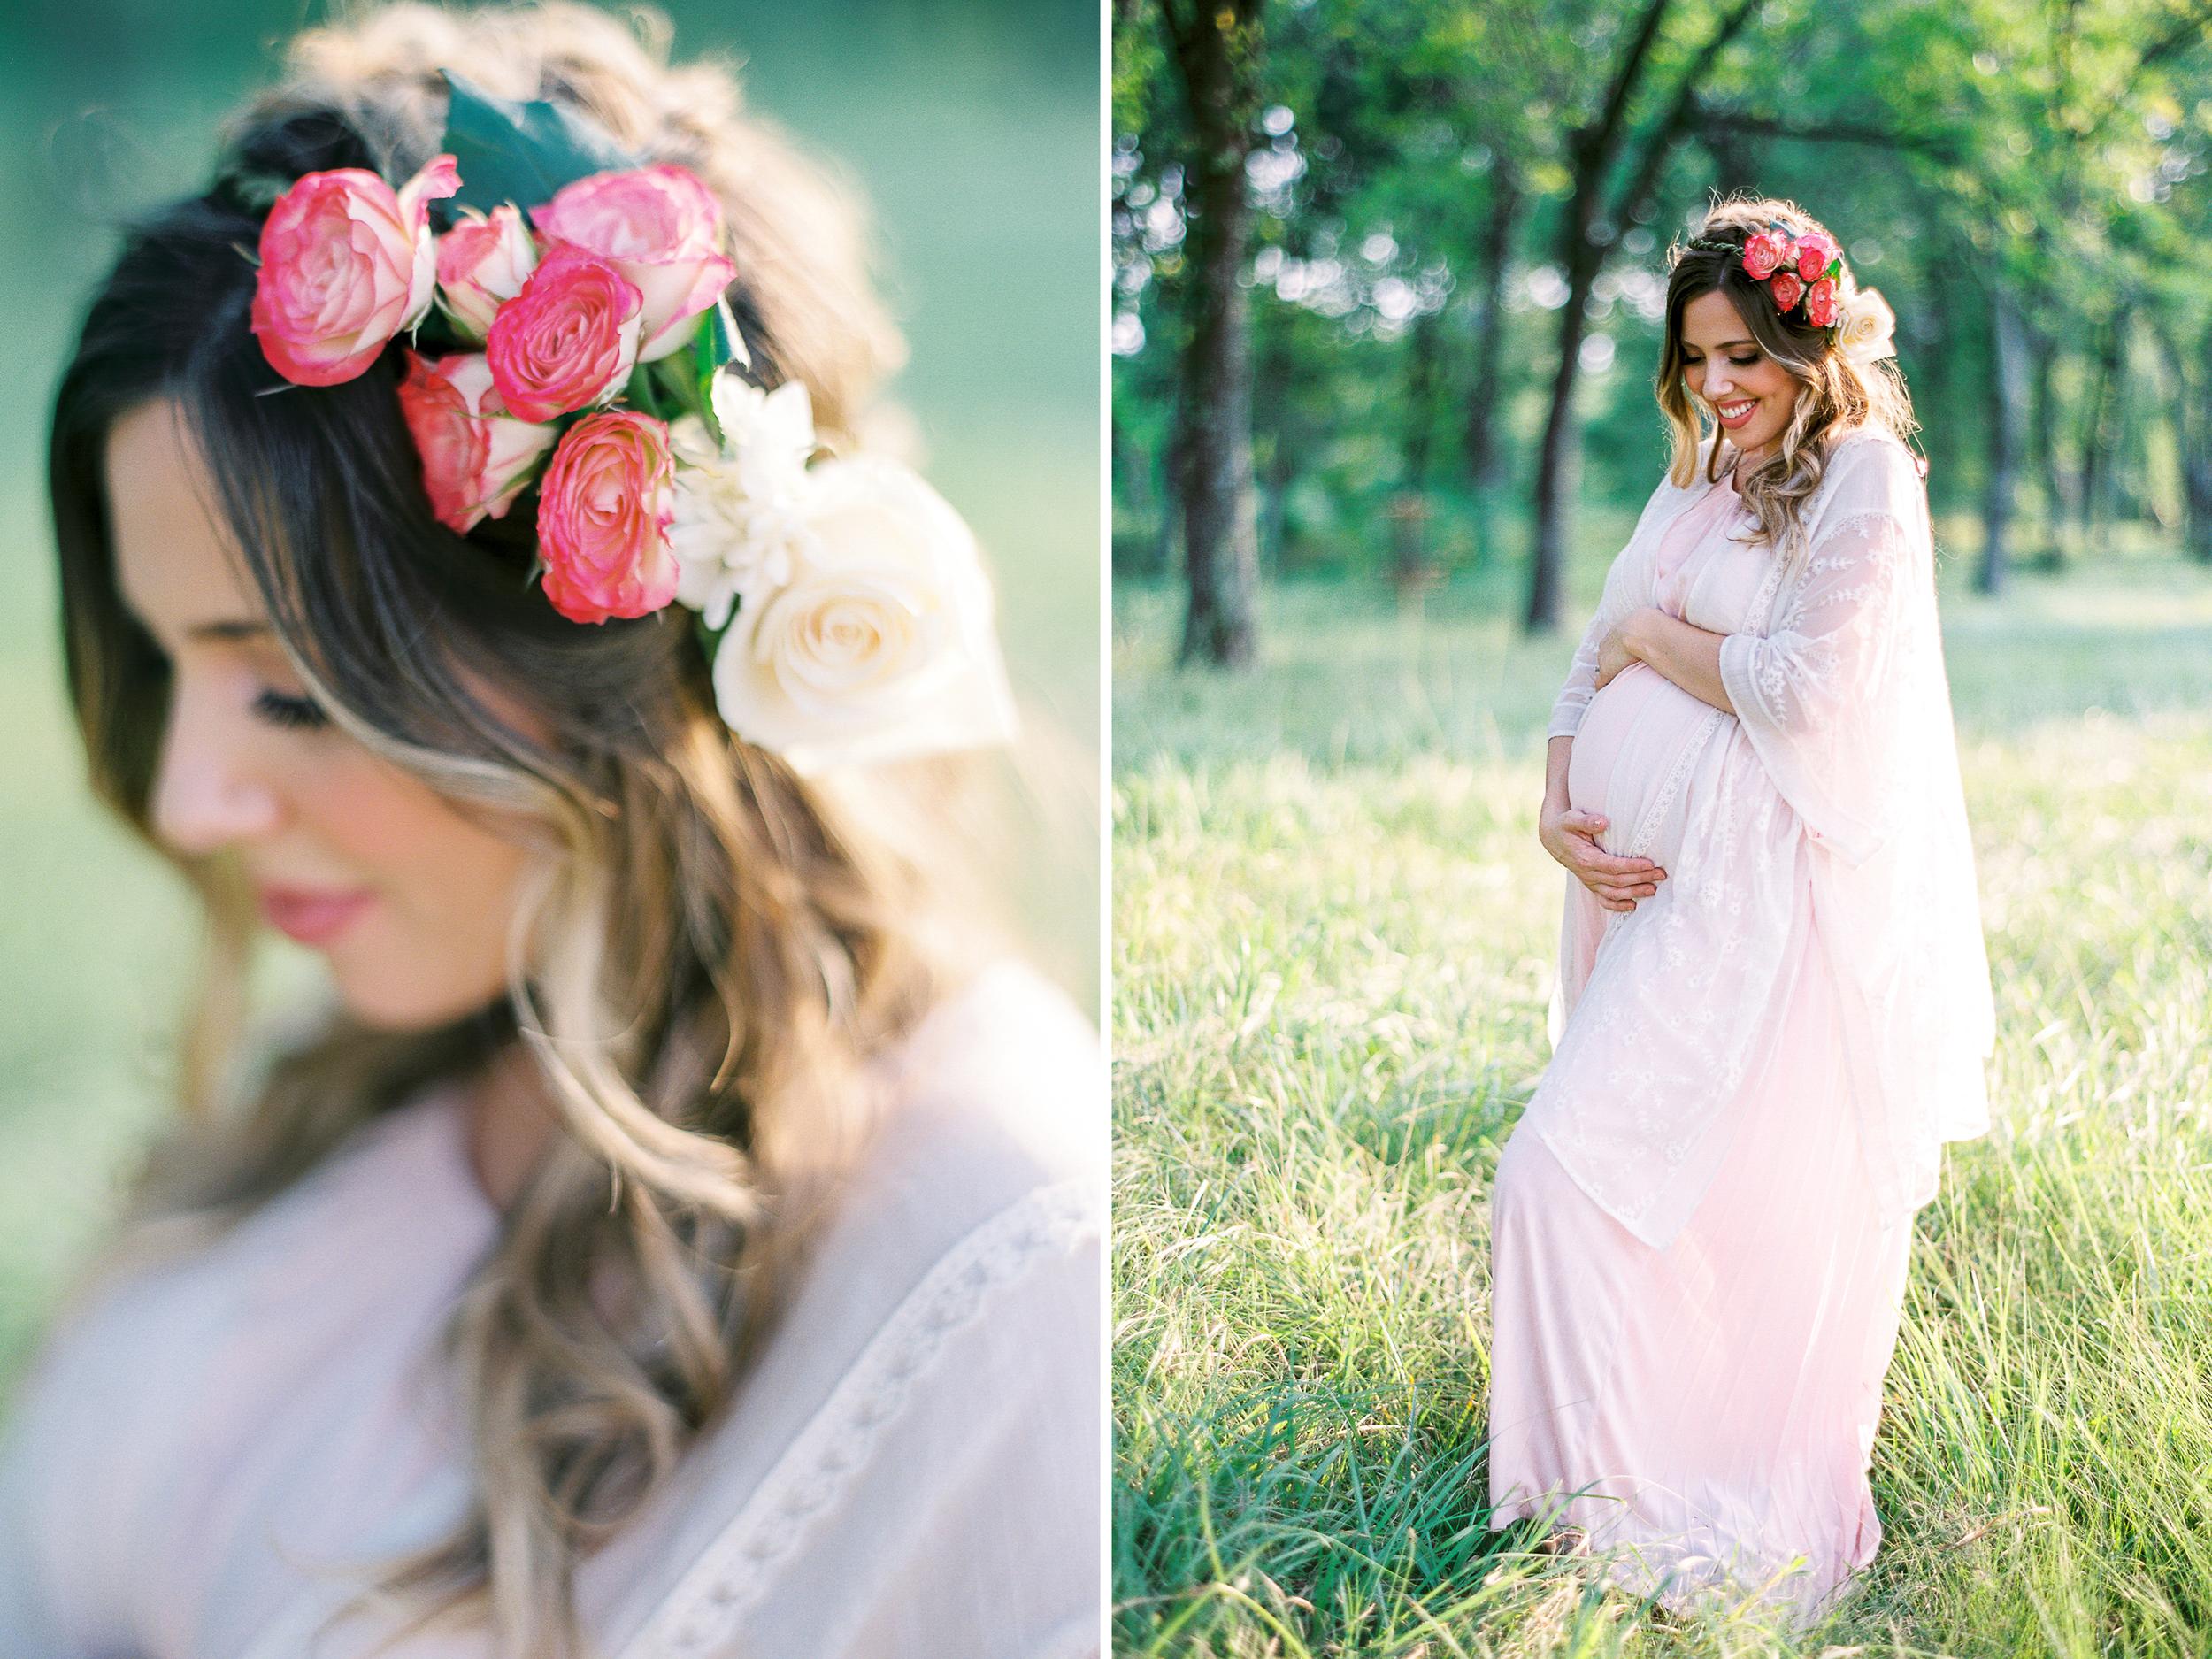 Dana-Fernandez-Photography-Houston-Maternity-Family-Portrait-Photographer-Film-103.jpg